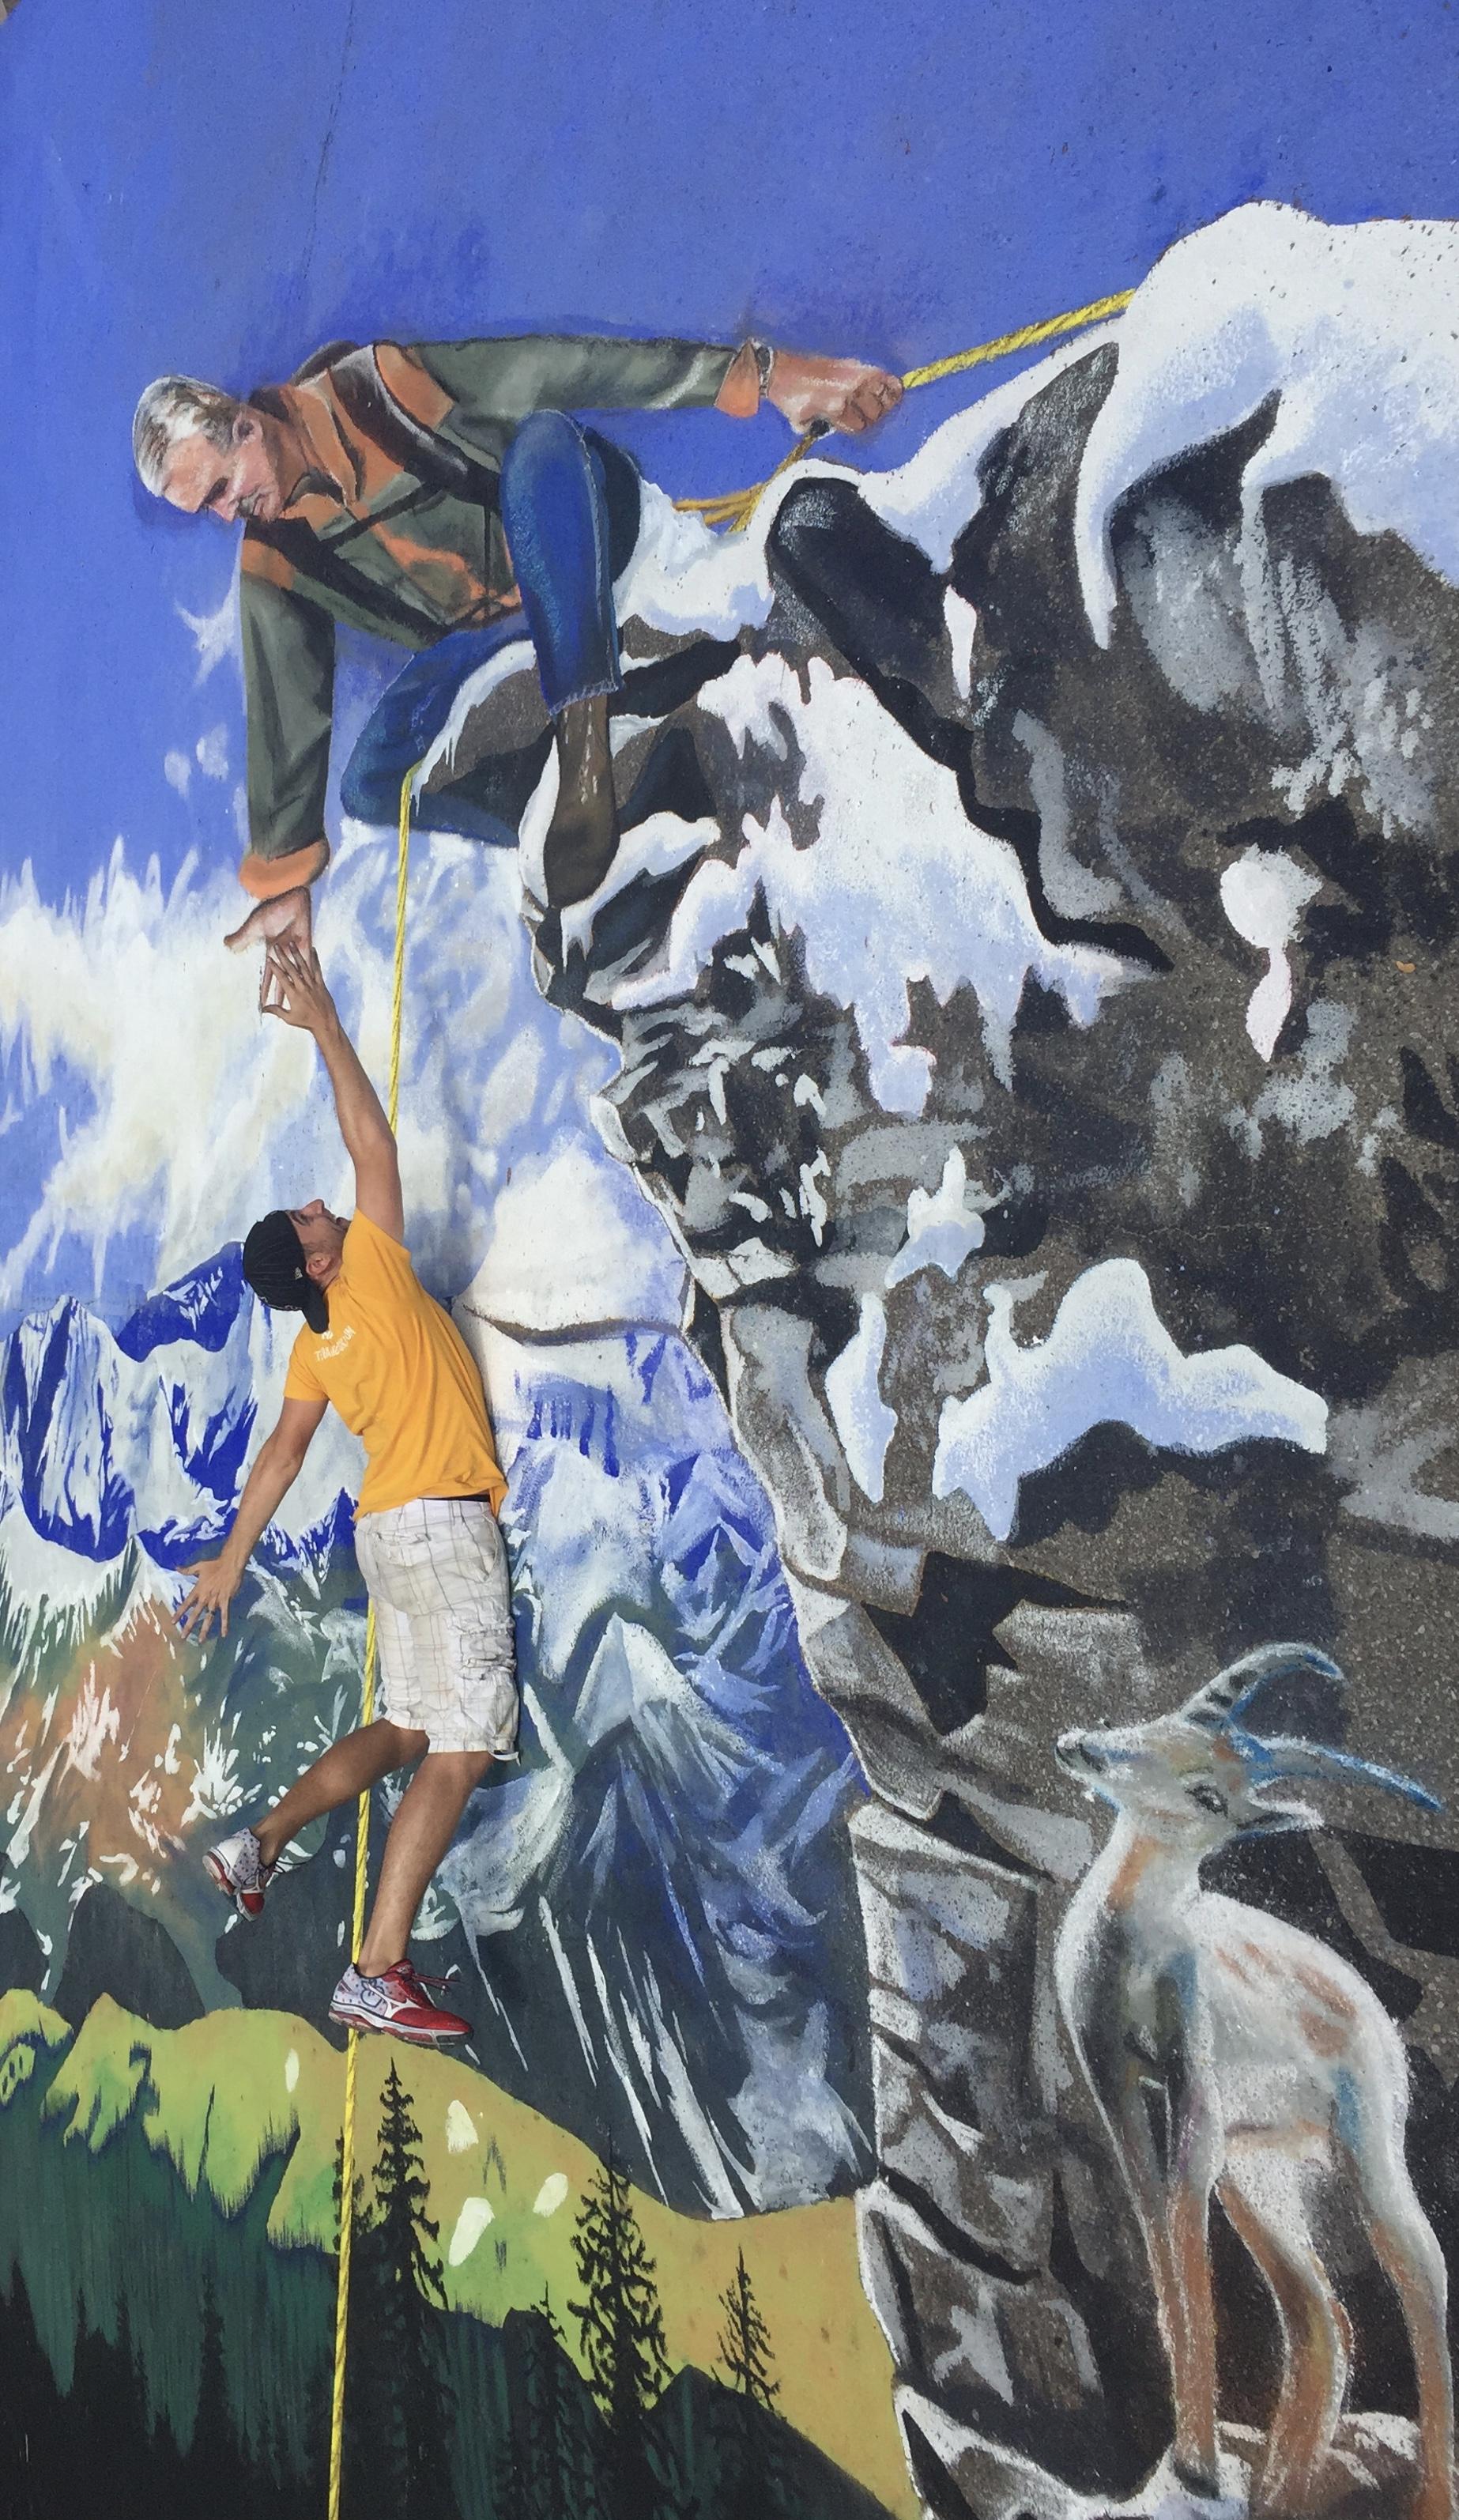 3D Street Painting: Rock Climber